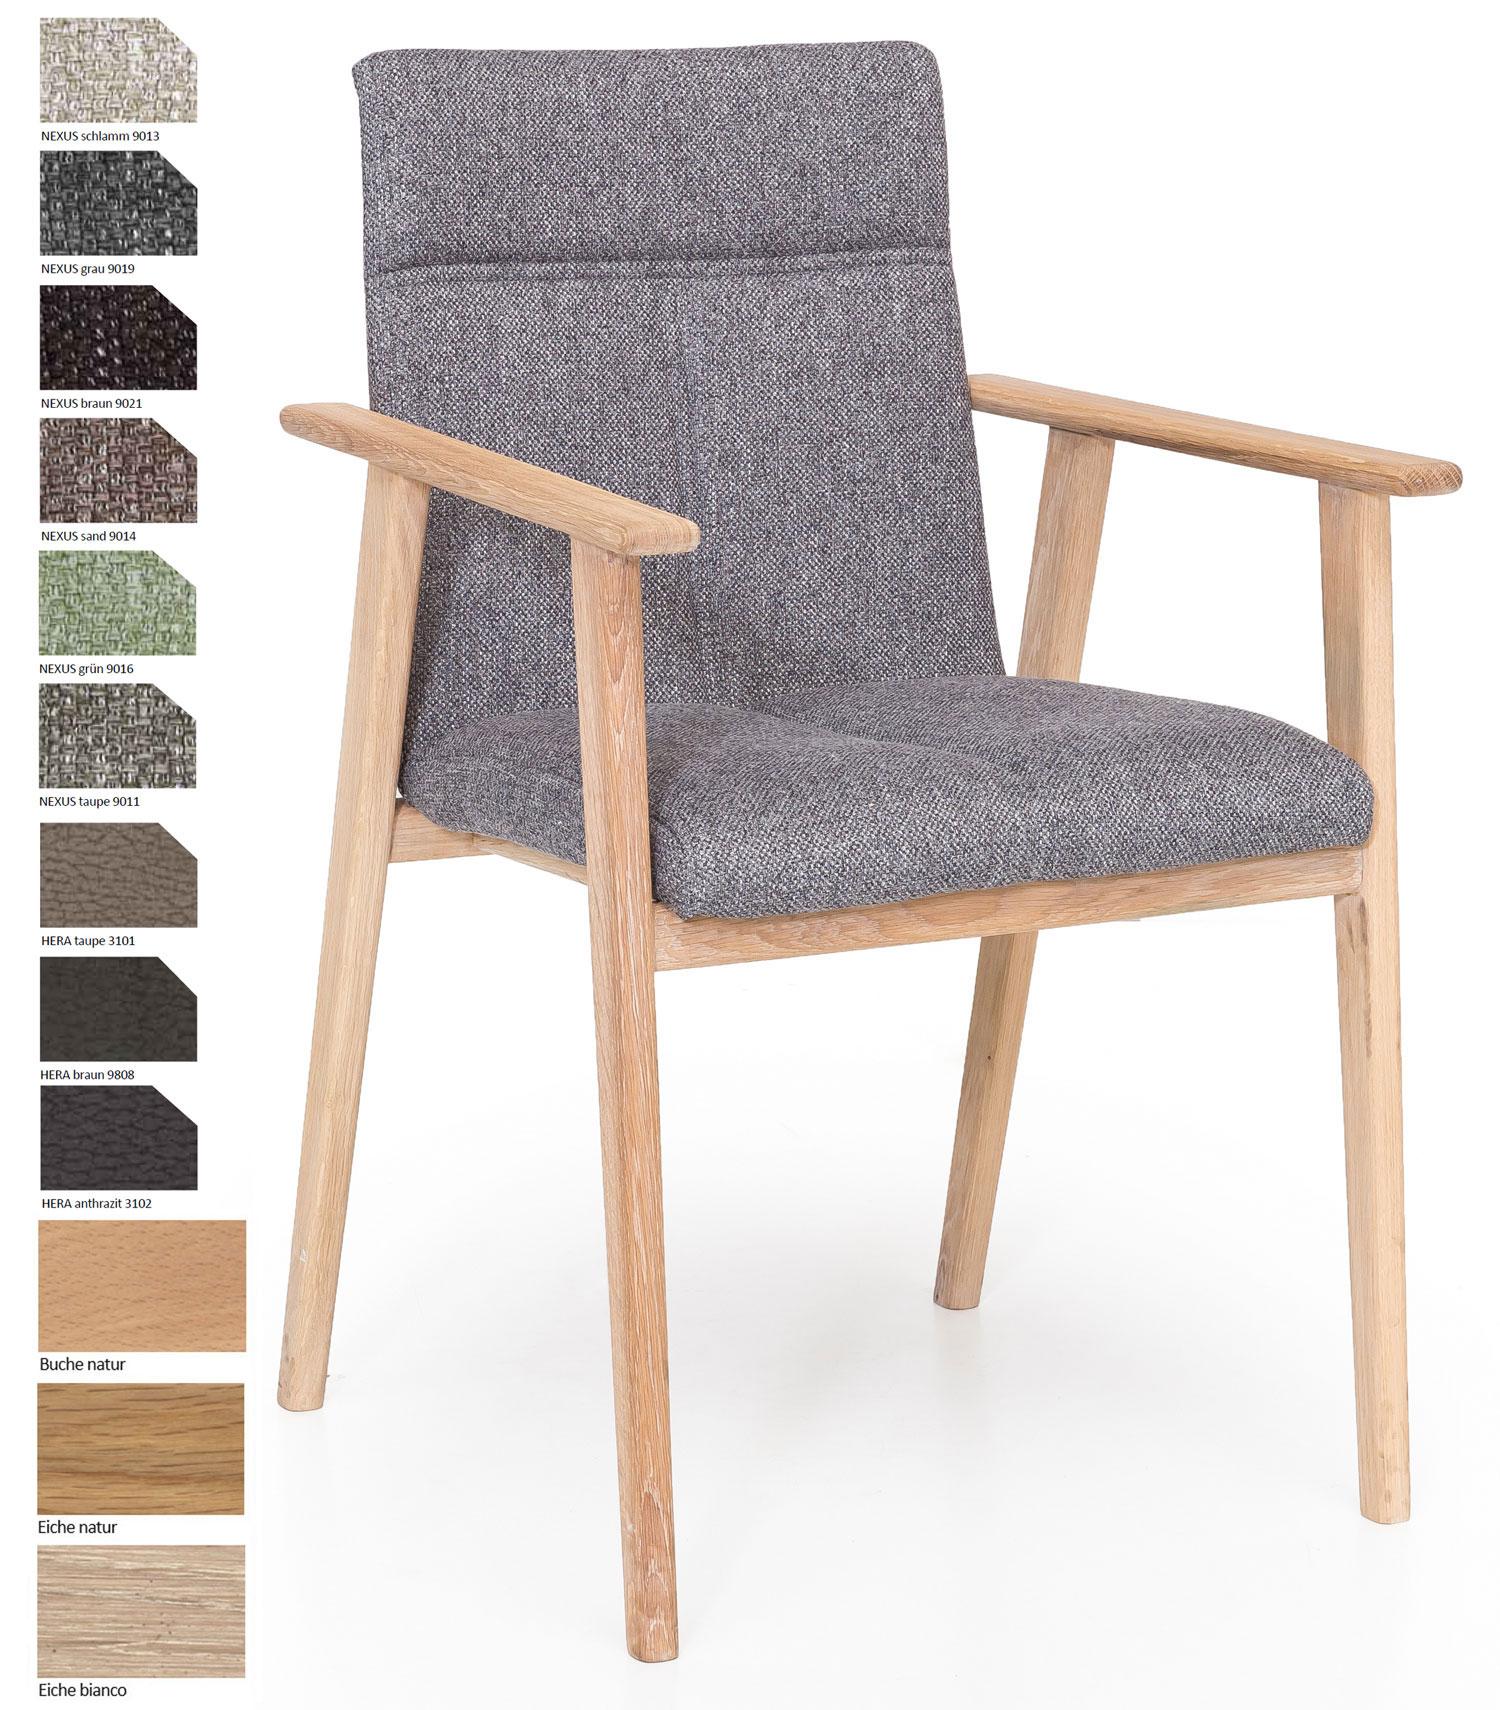 Standard Furniture Alina Armlehnstuhl eiche / grau